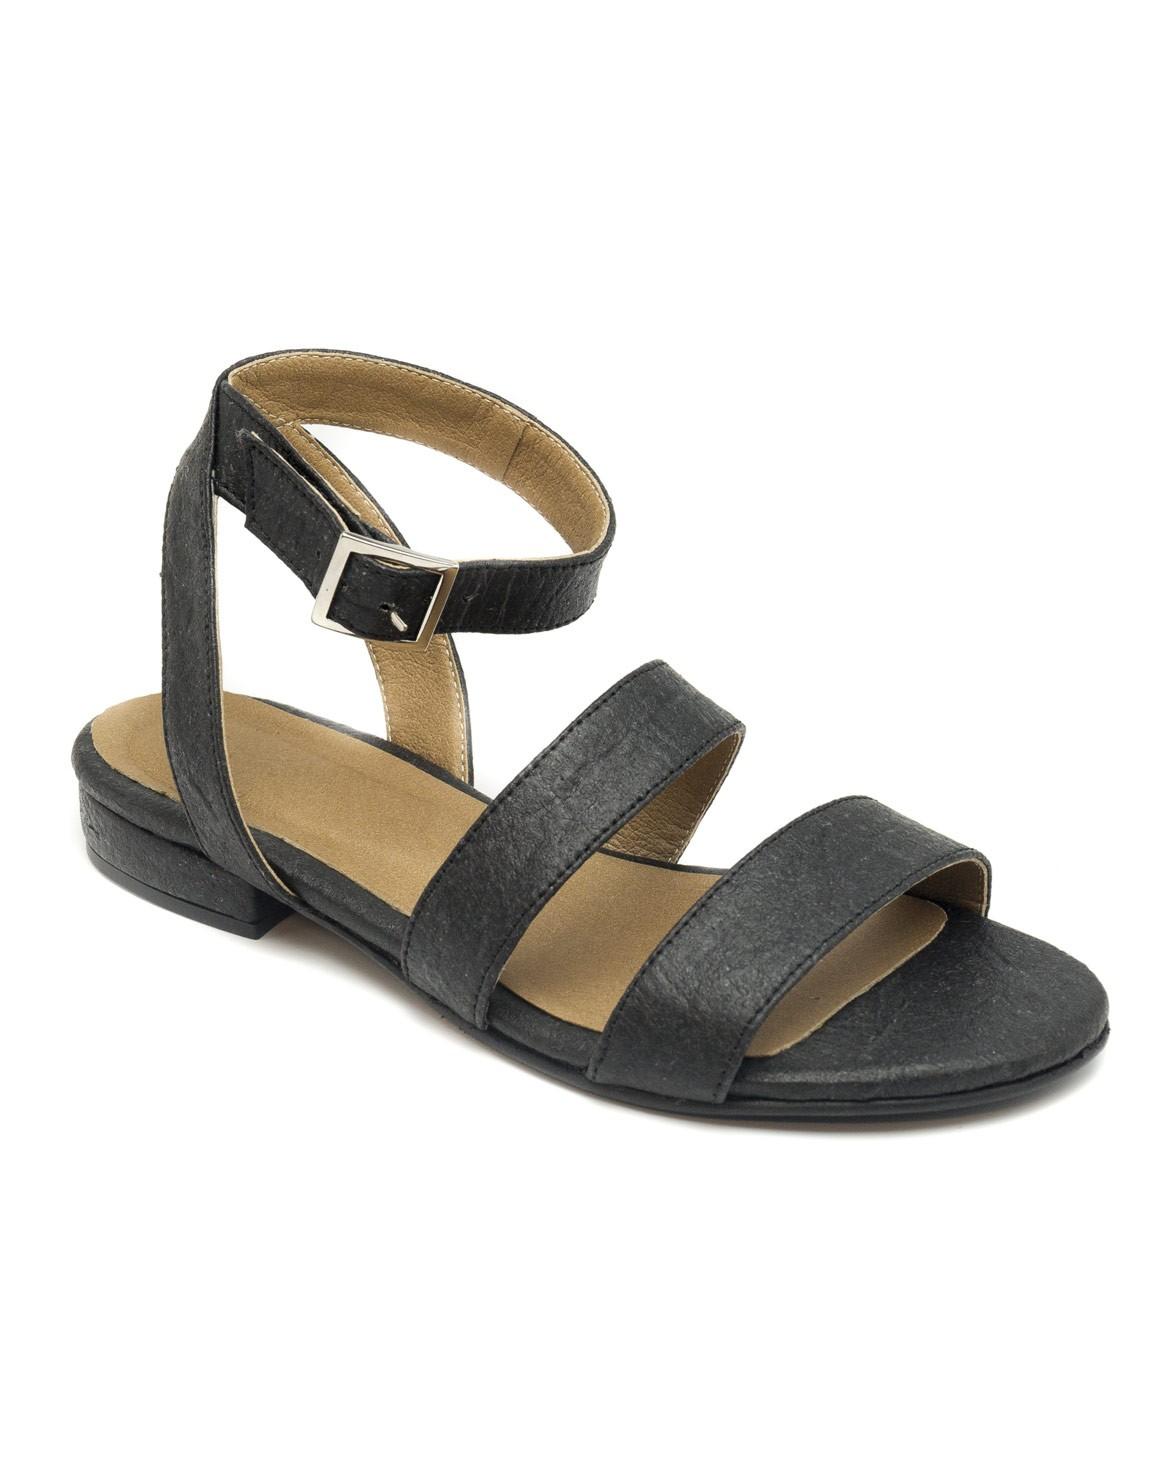 Gatria Sandal